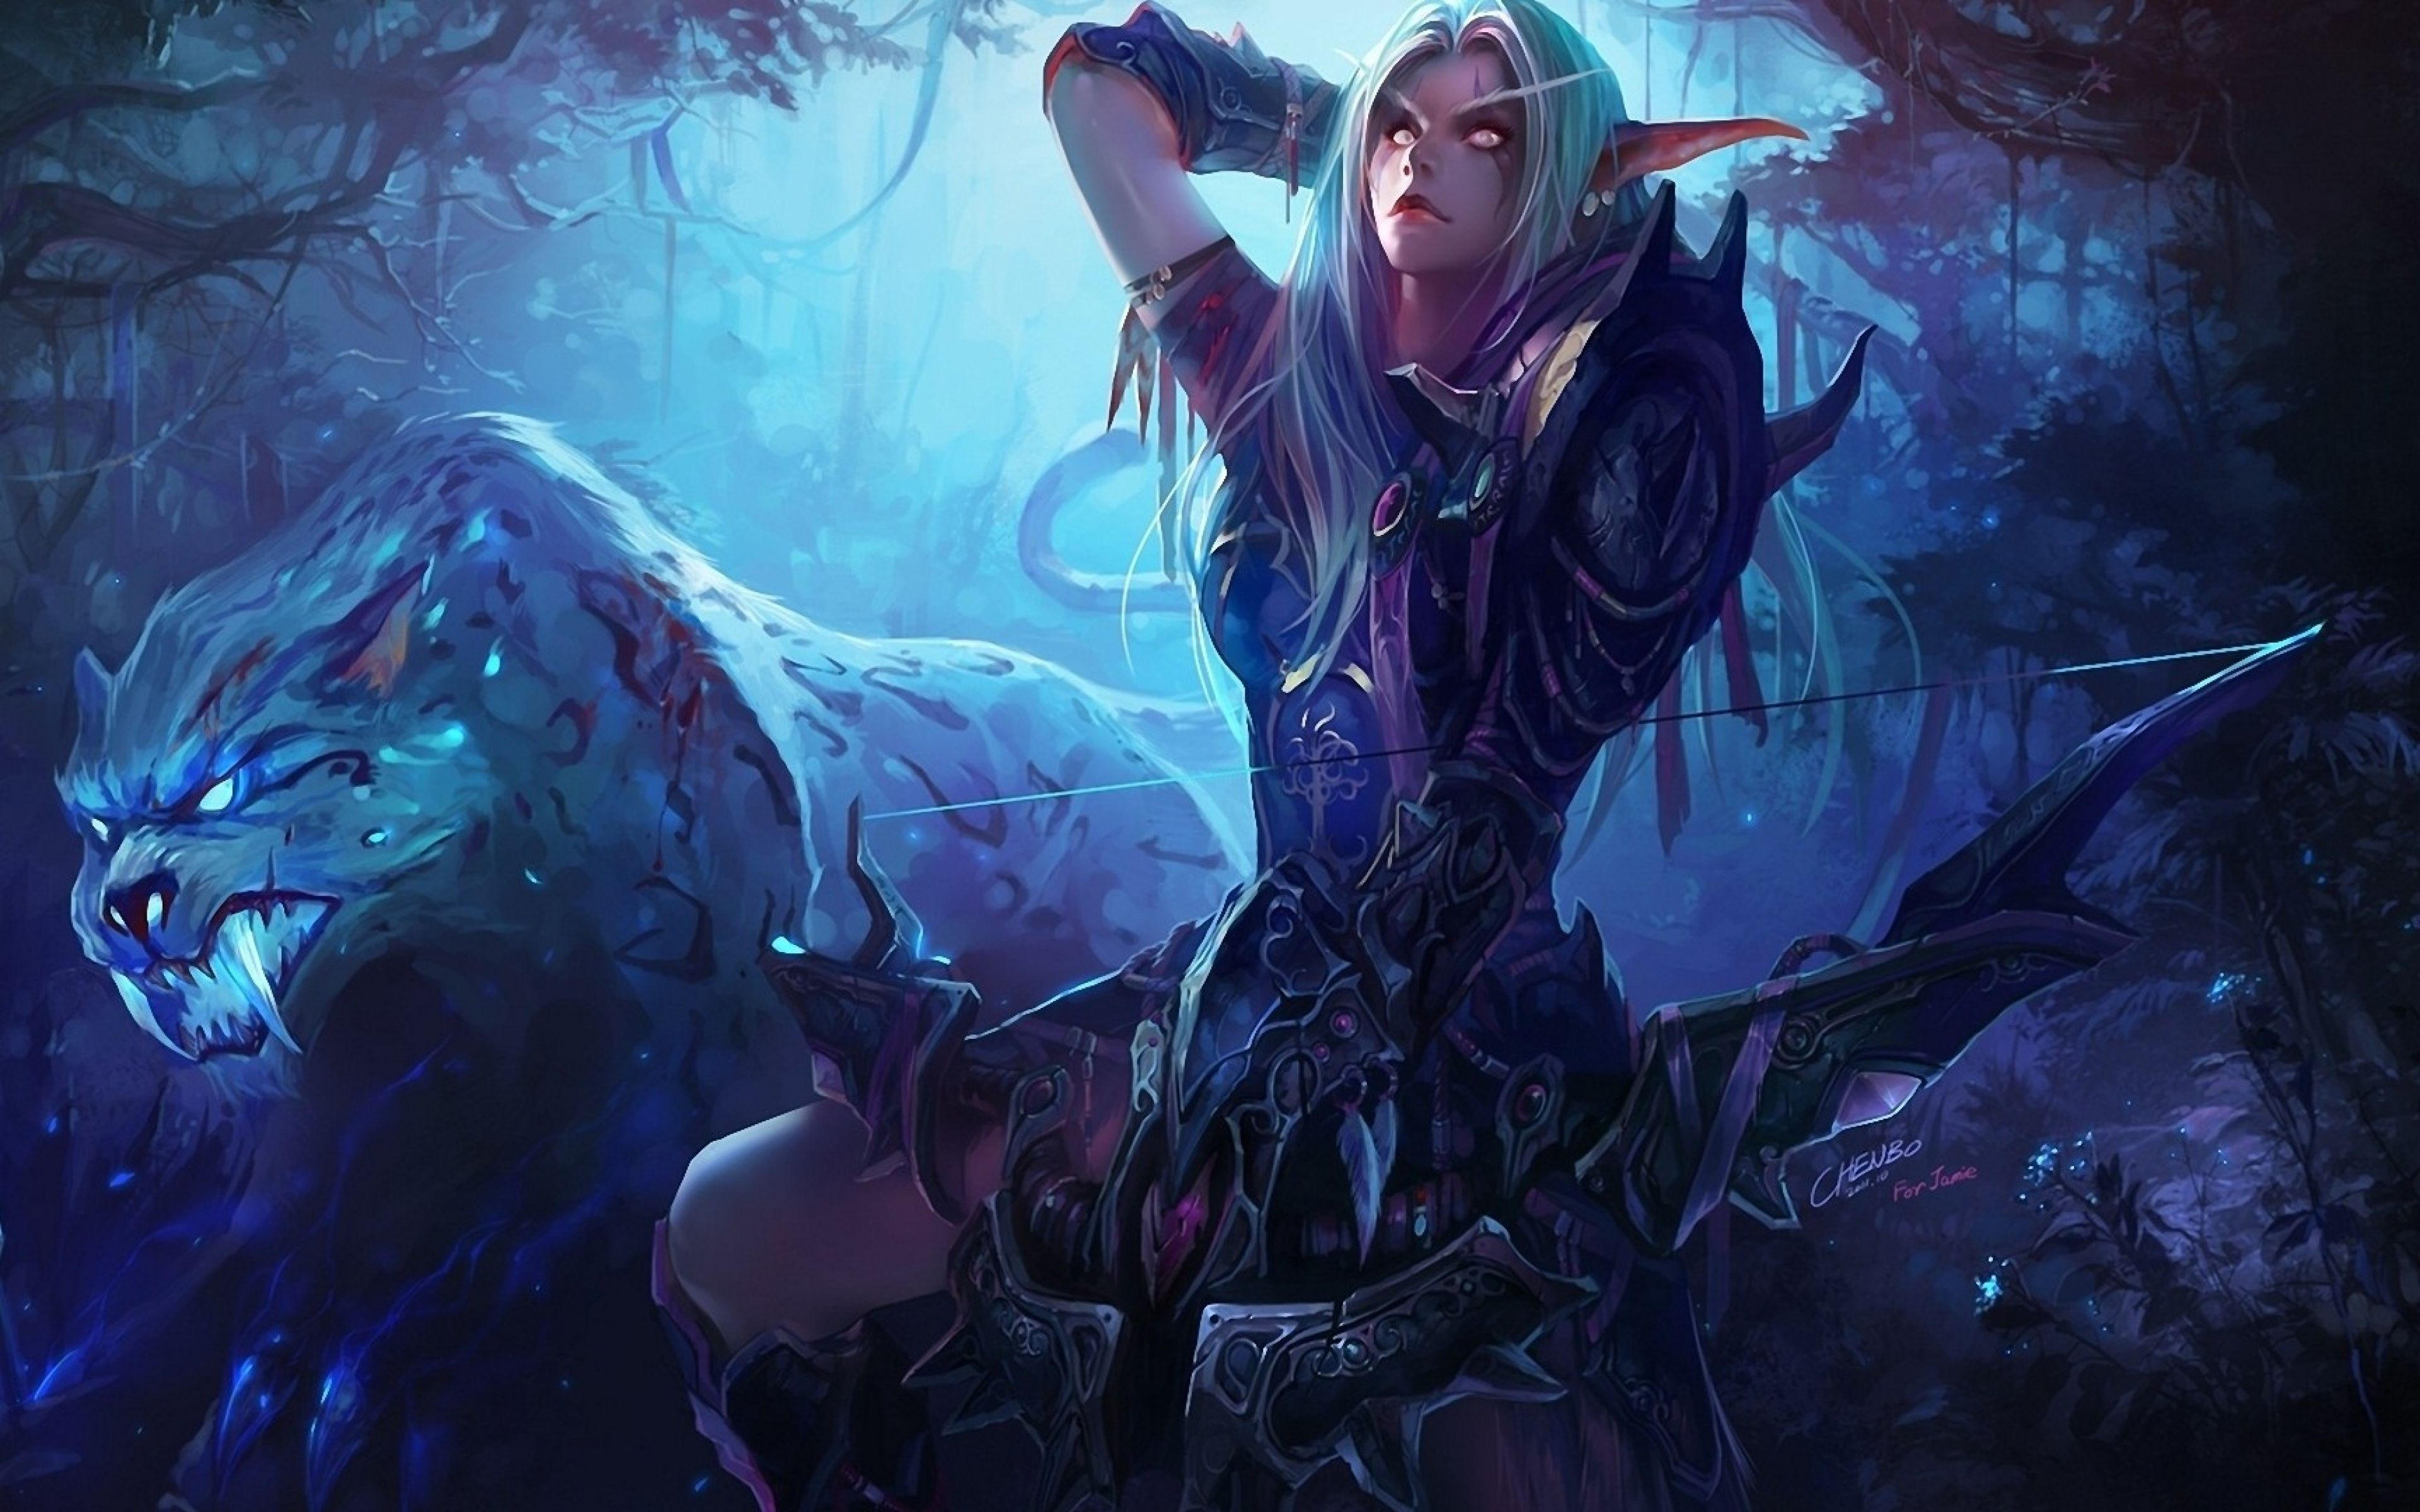 3840x2400 Jpg 3840 2400 World Of Warcraft Wallpaper Warcraft Art World Of Warcraft